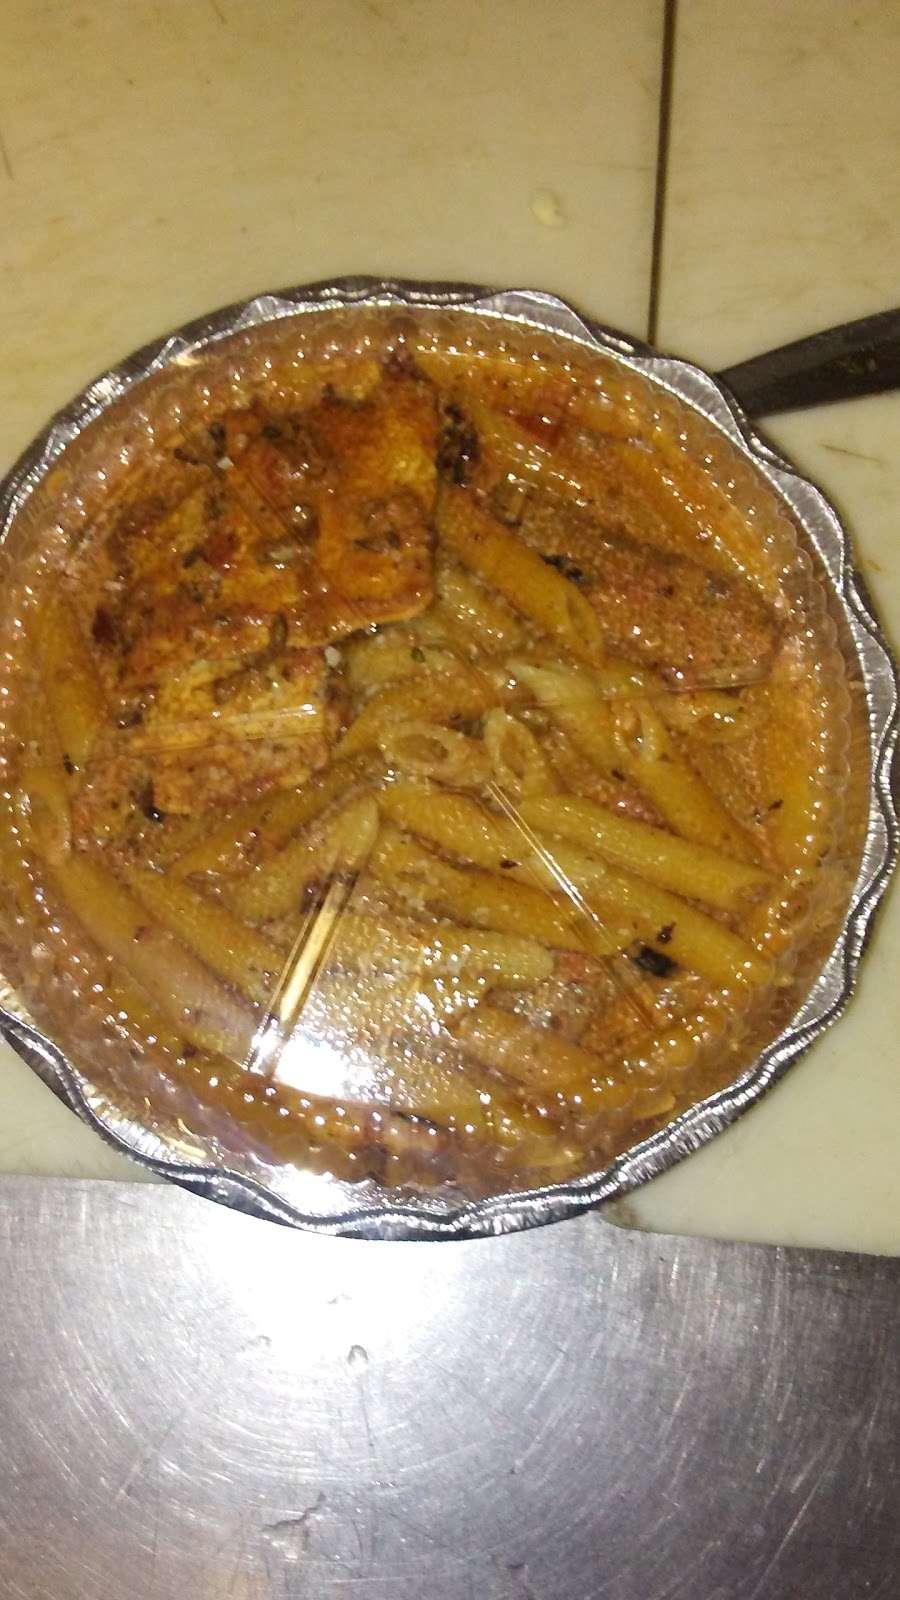 Salerno Pizza - meal delivery  | Photo 9 of 10 | Address: 364 Summit Ave, Jersey City, NJ 07306, USA | Phone: (201) 918-2345